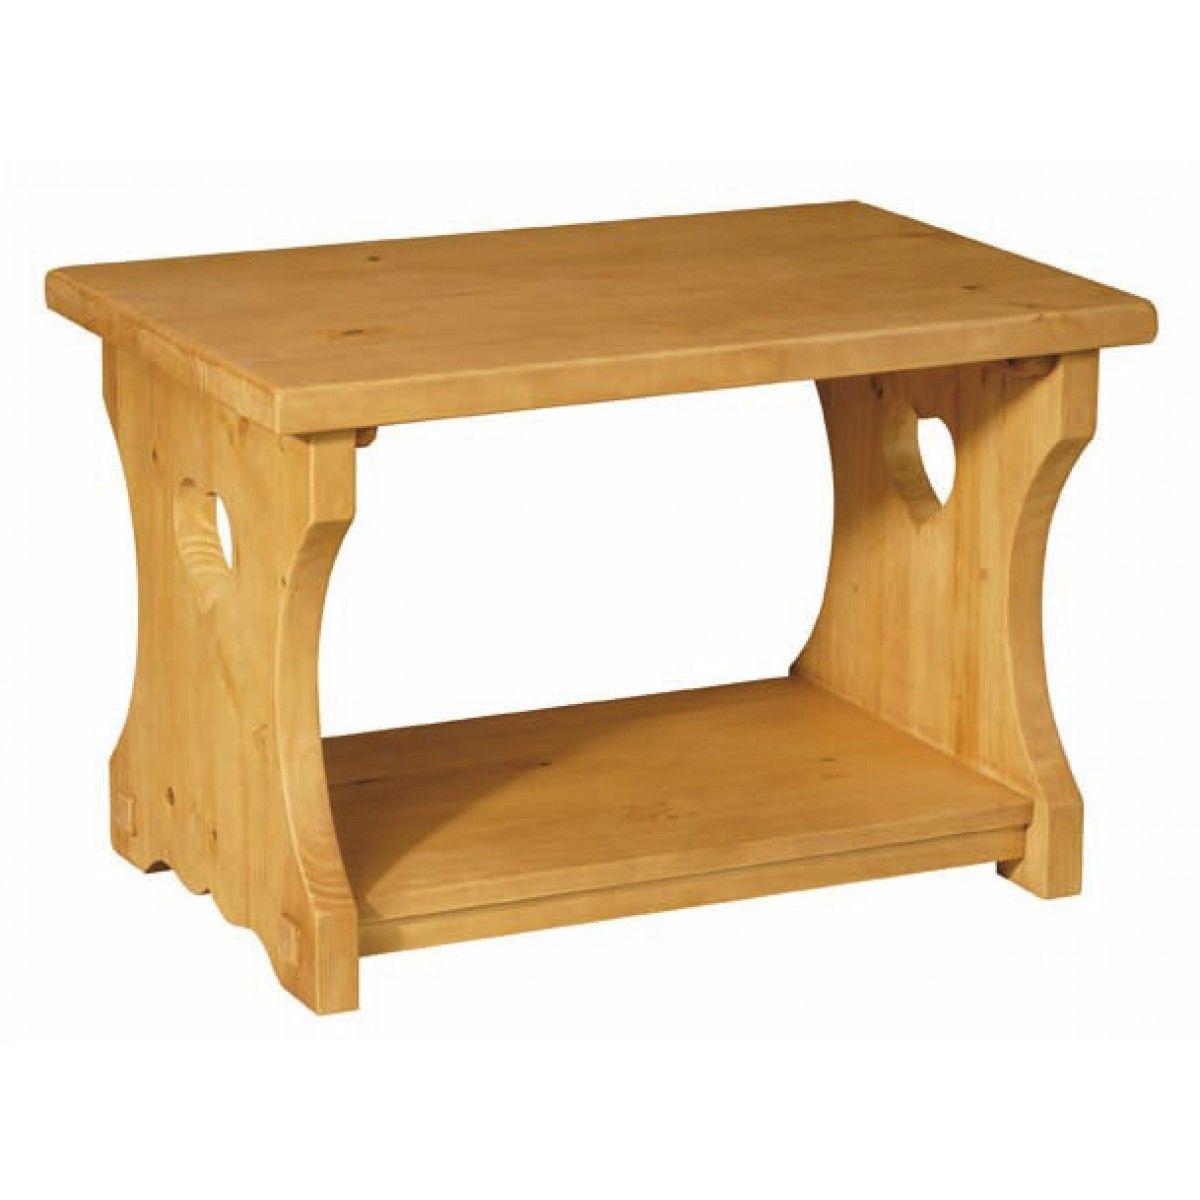 table basse en pin avec coeur 2 plateaux grenier alpin pinterest. Black Bedroom Furniture Sets. Home Design Ideas